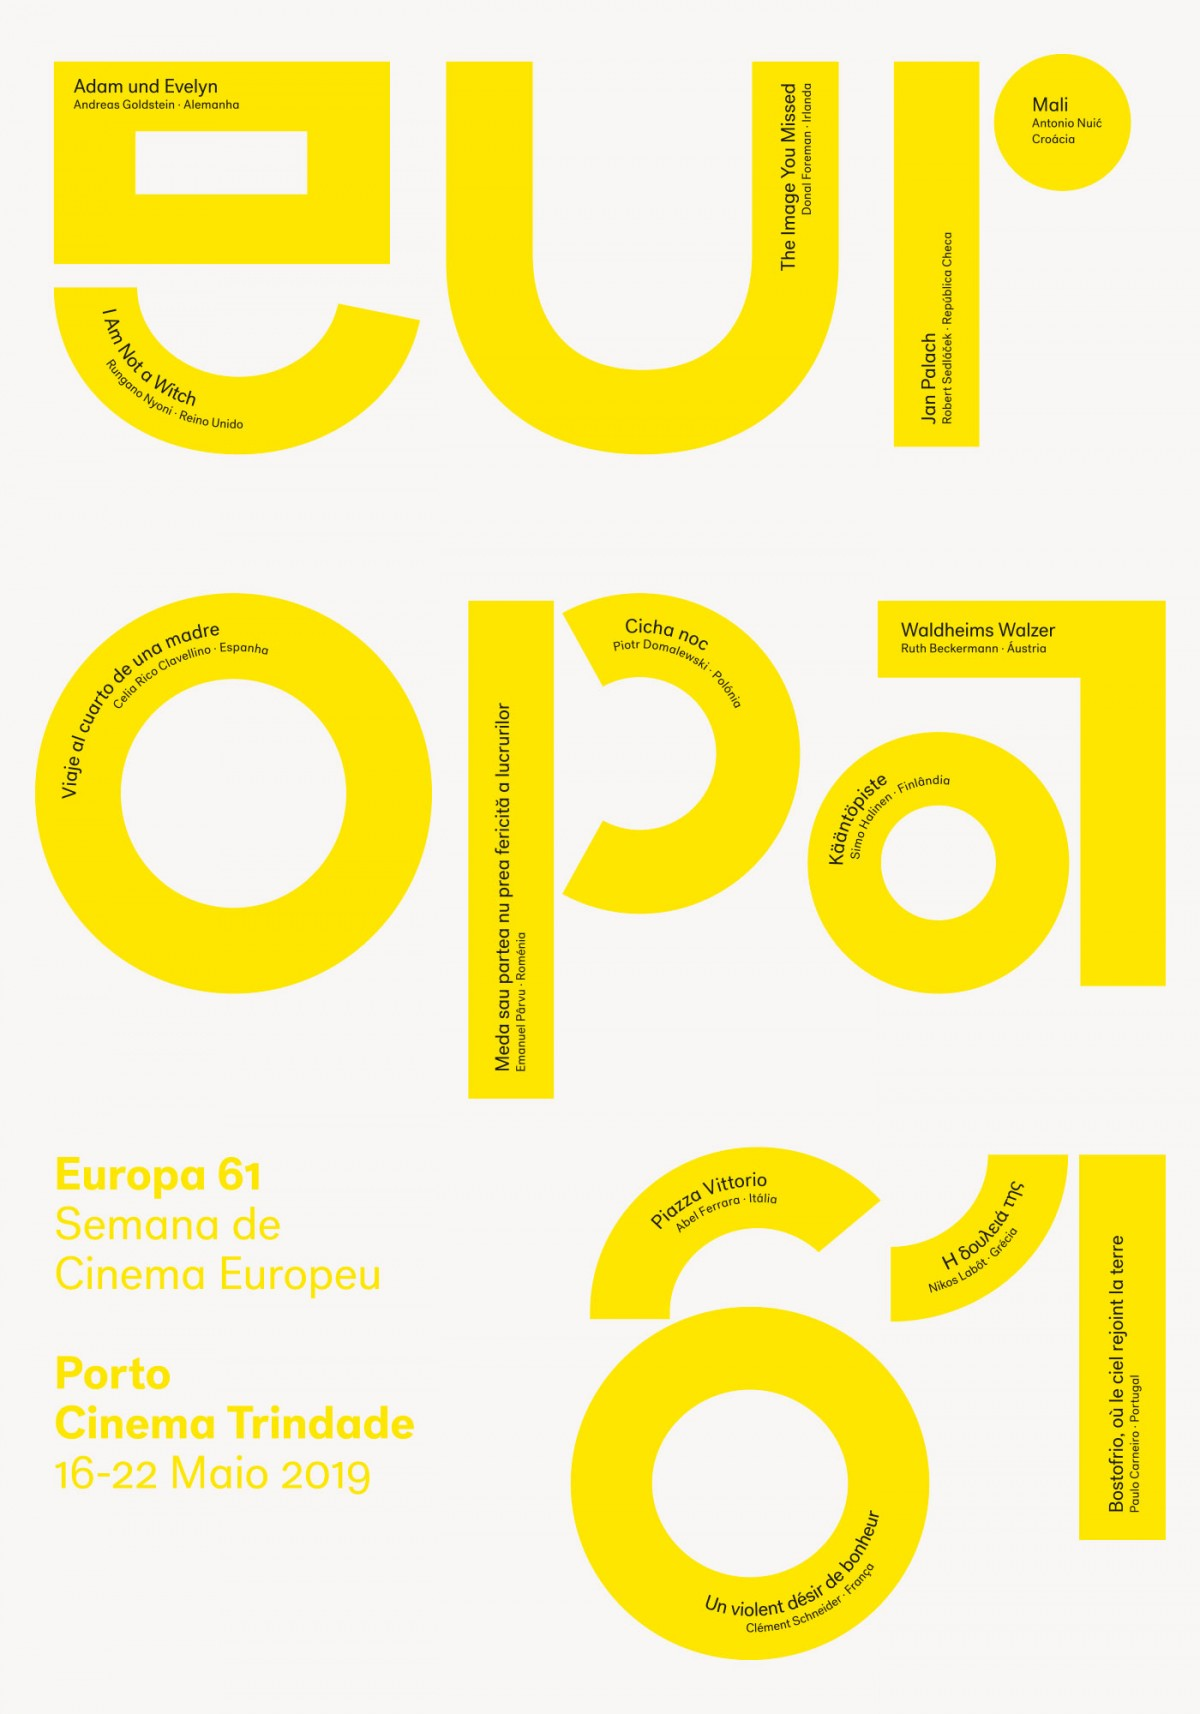 Europa'61 Image:1.2